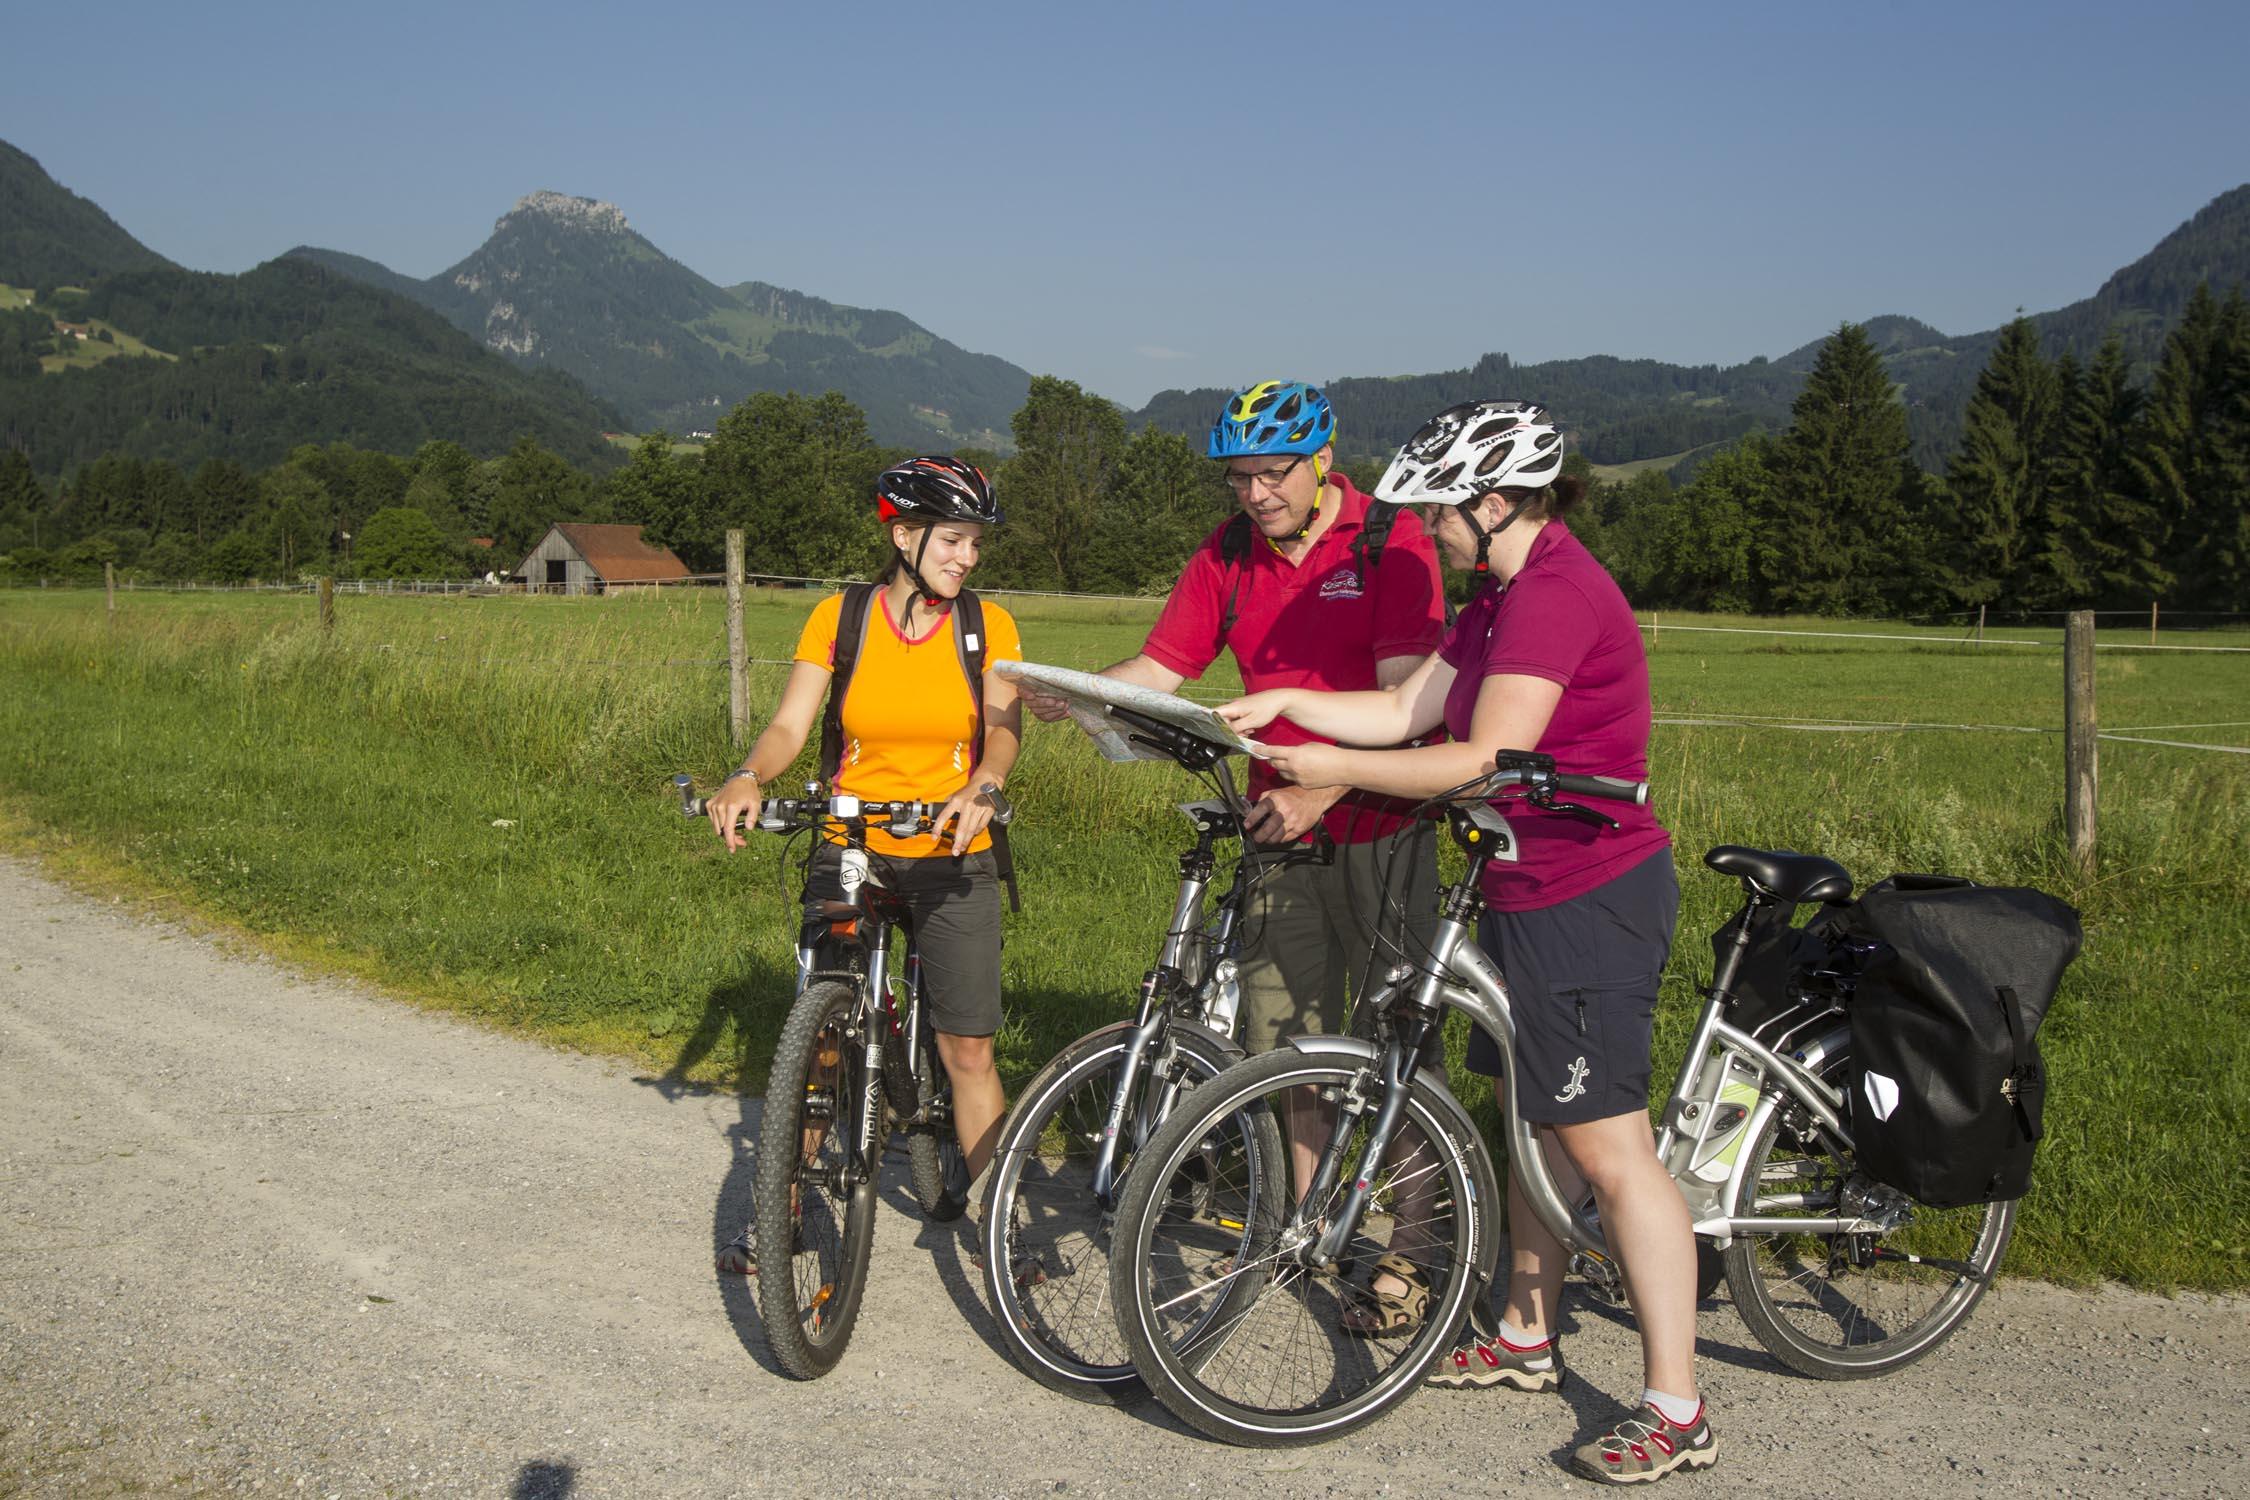 Mountainbiketour rund um den Tatzelwurm